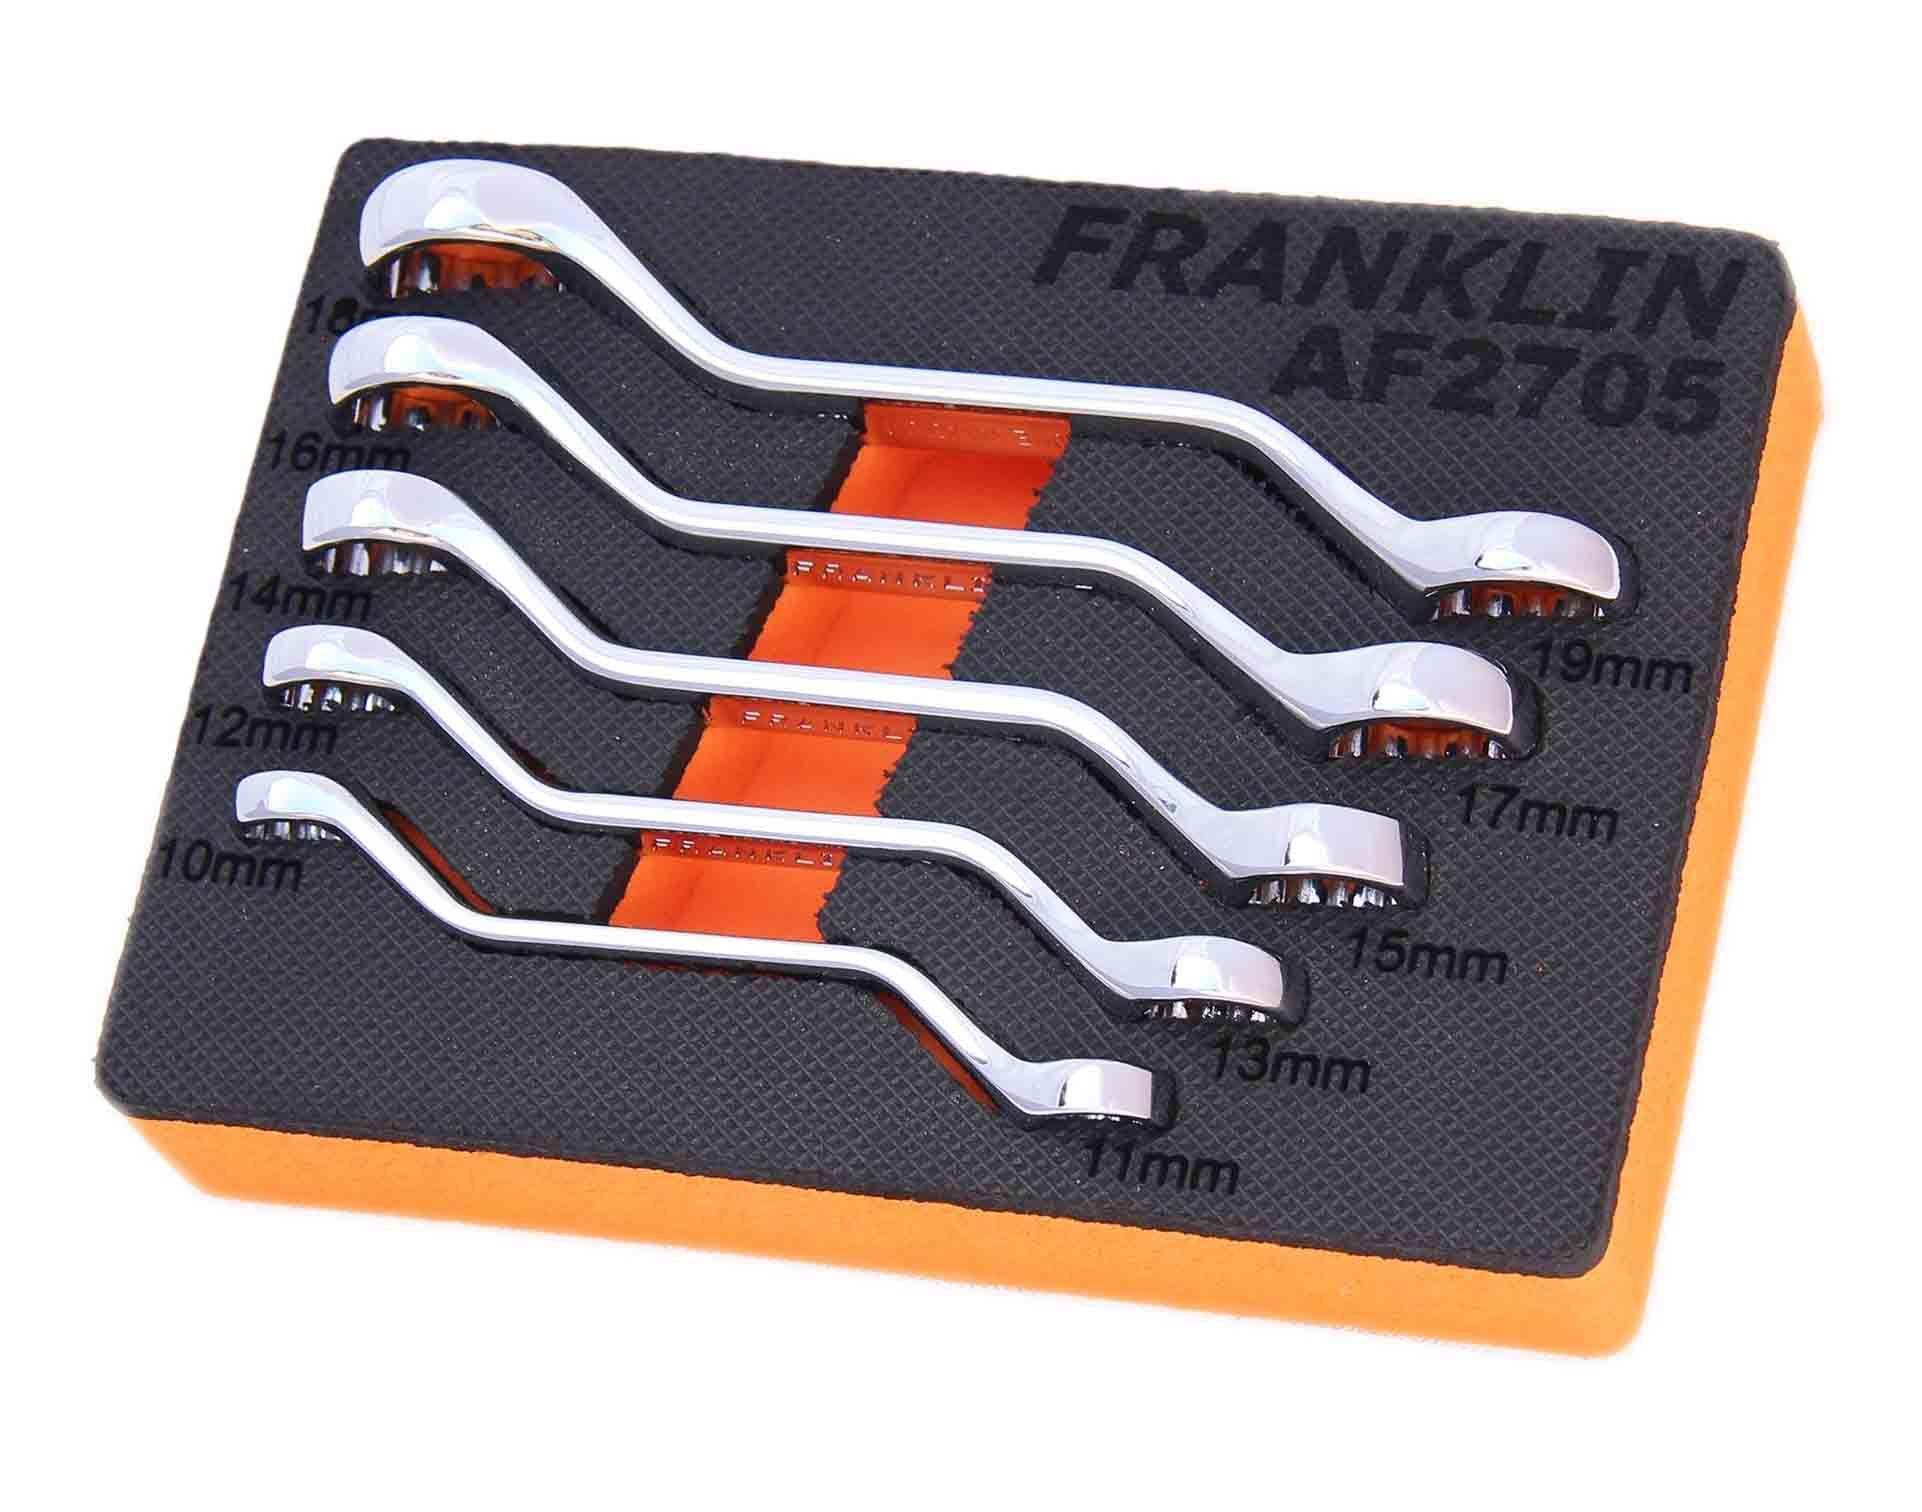 Franklin 5 Piece 12 Point Mini Ring Spanner Set